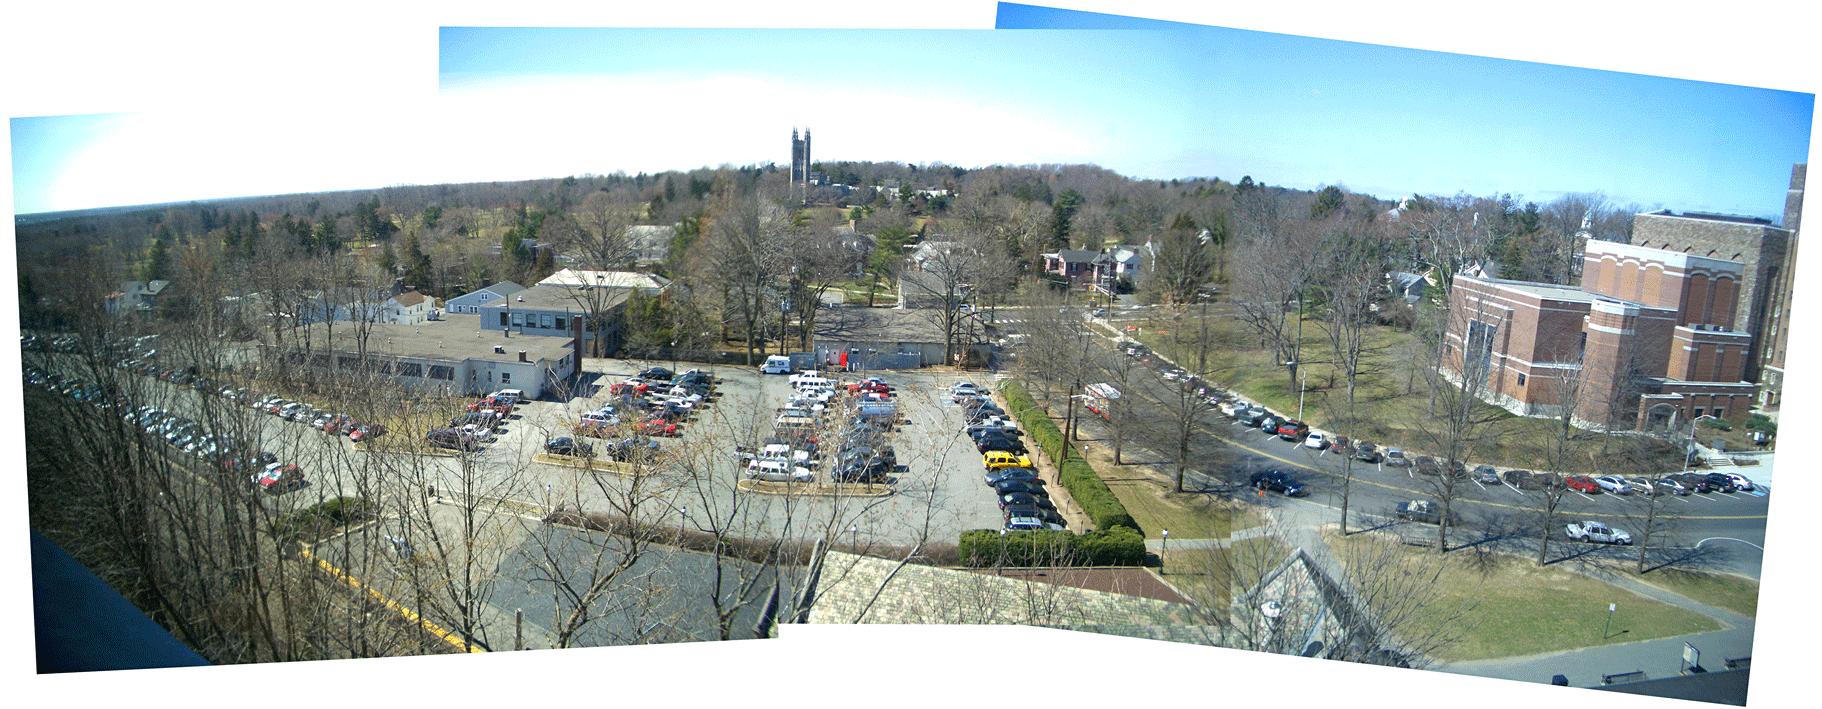 Princeton_Site001.png